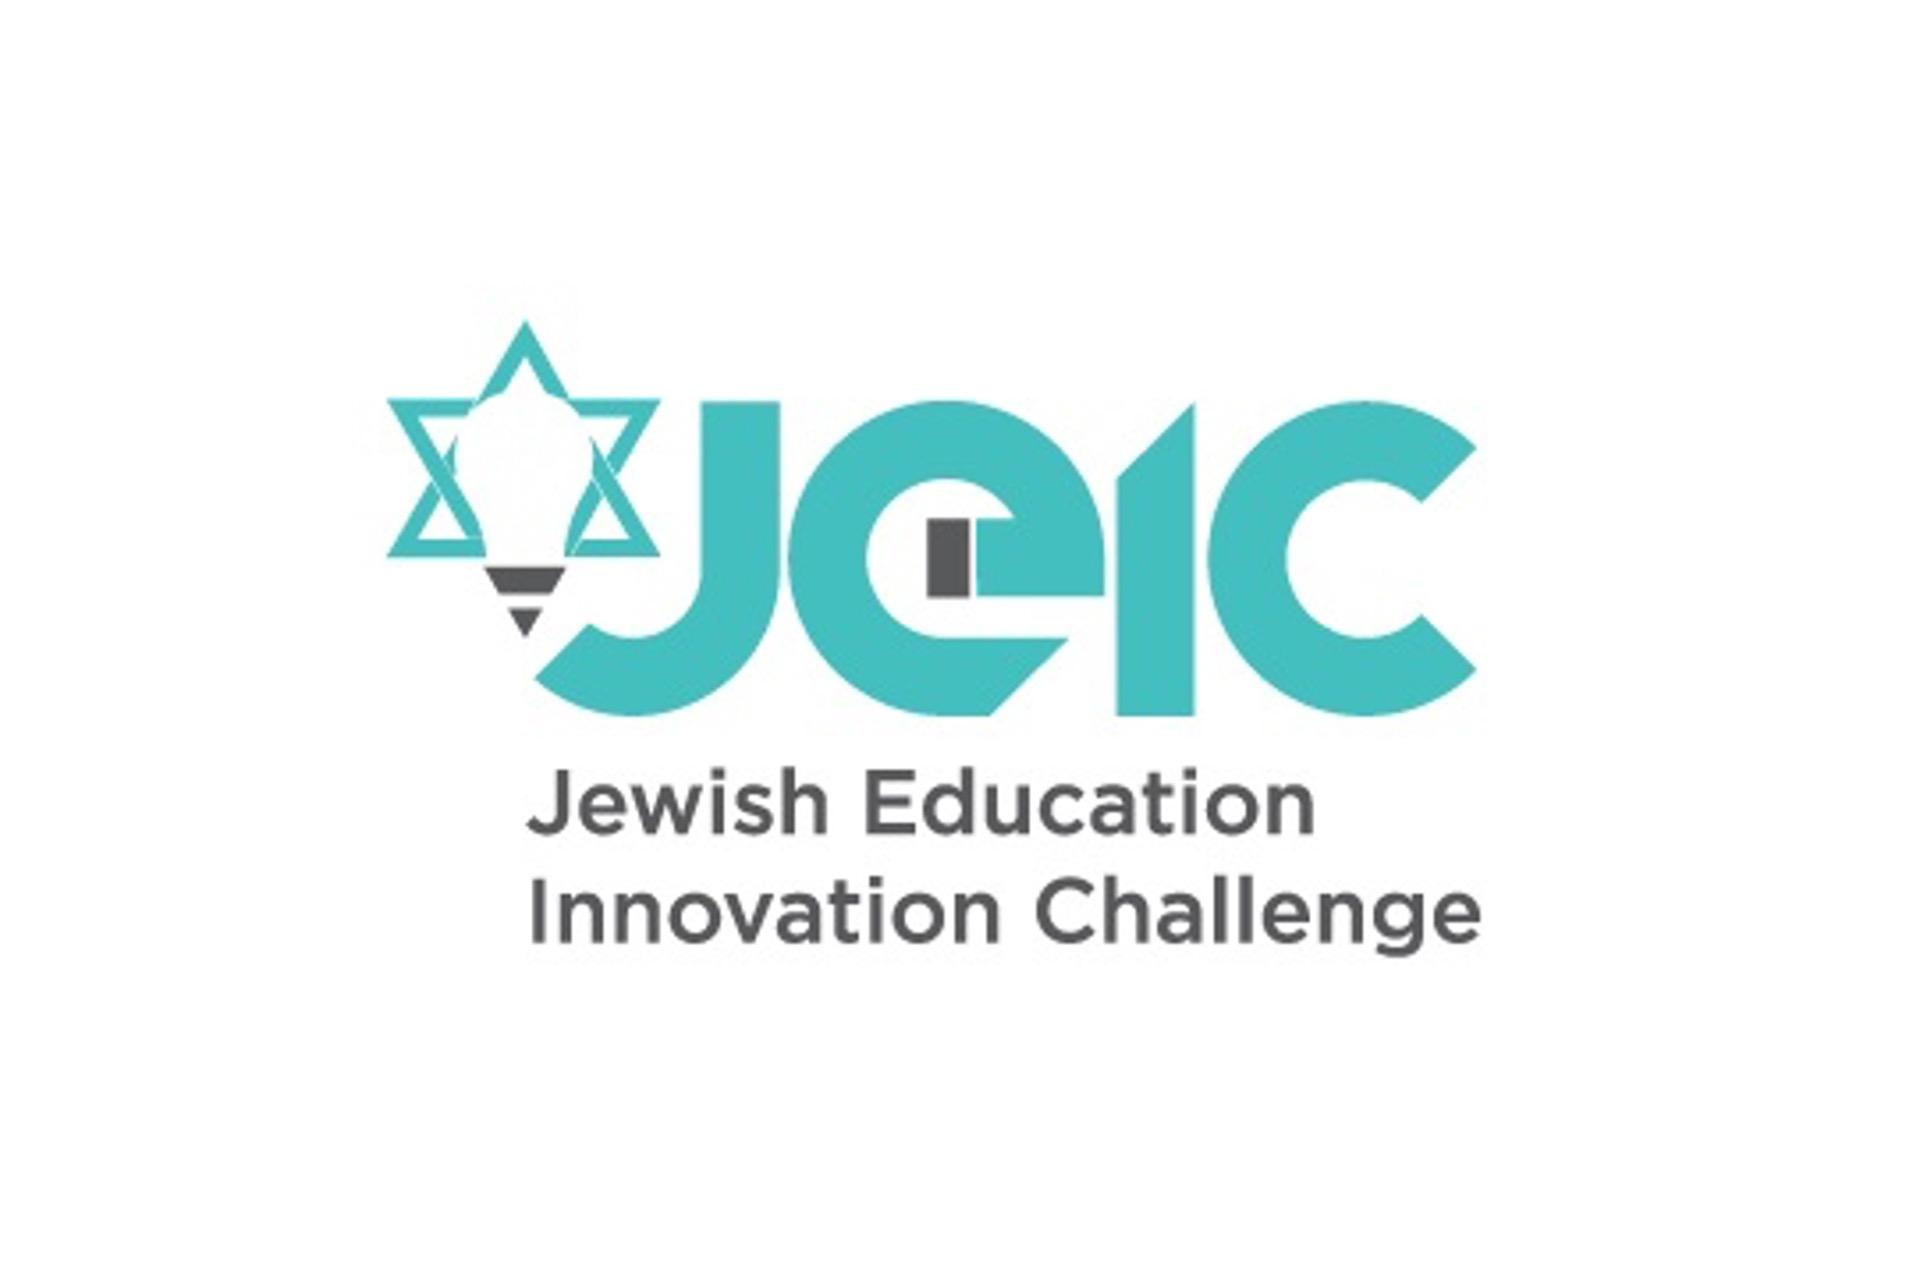 Jewish Education Innovation Challenge